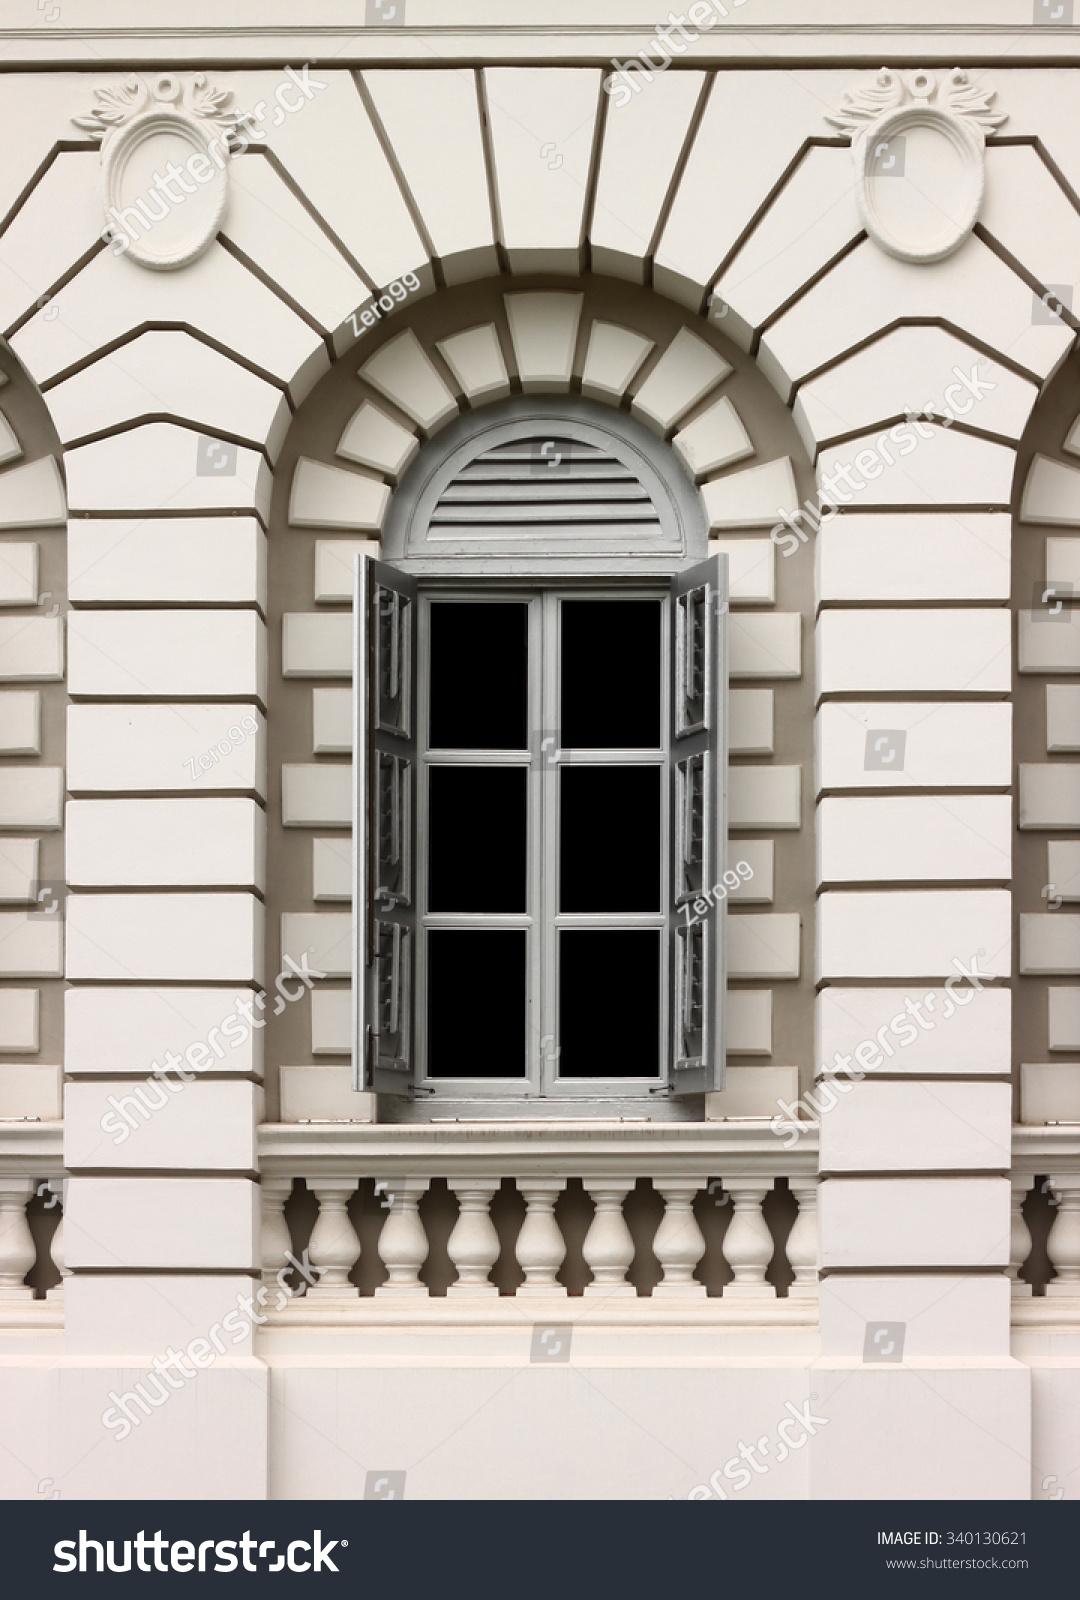 Window europe style stock photo 340130621 shutterstock for European style windows